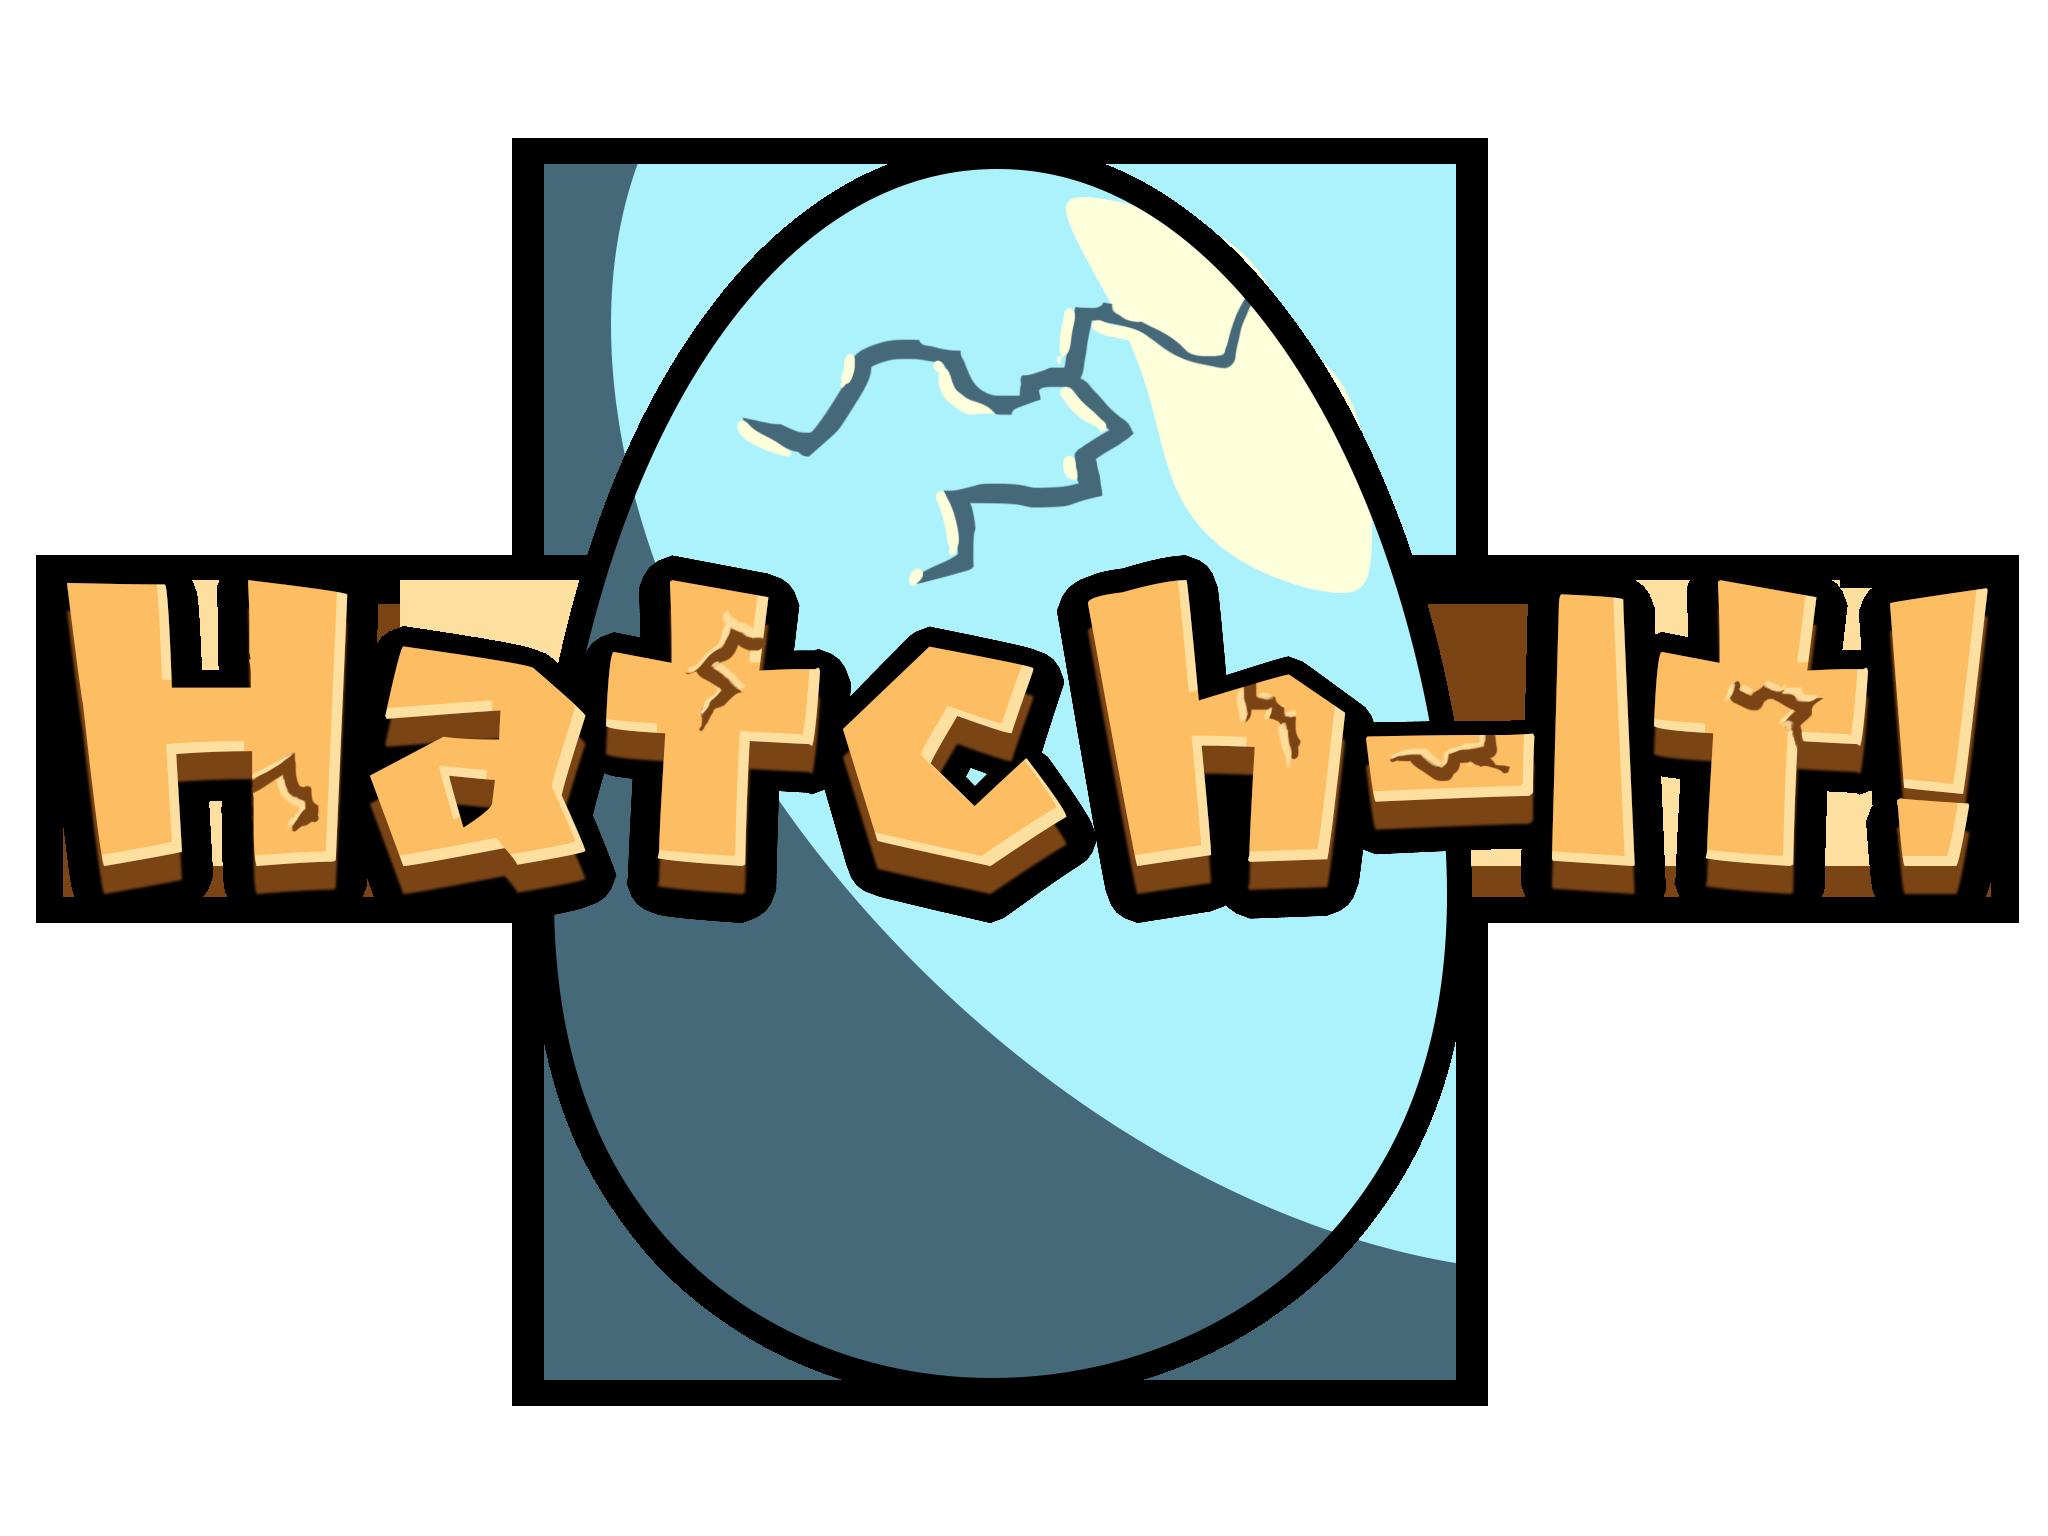 Hatch-It!-logo-large.png